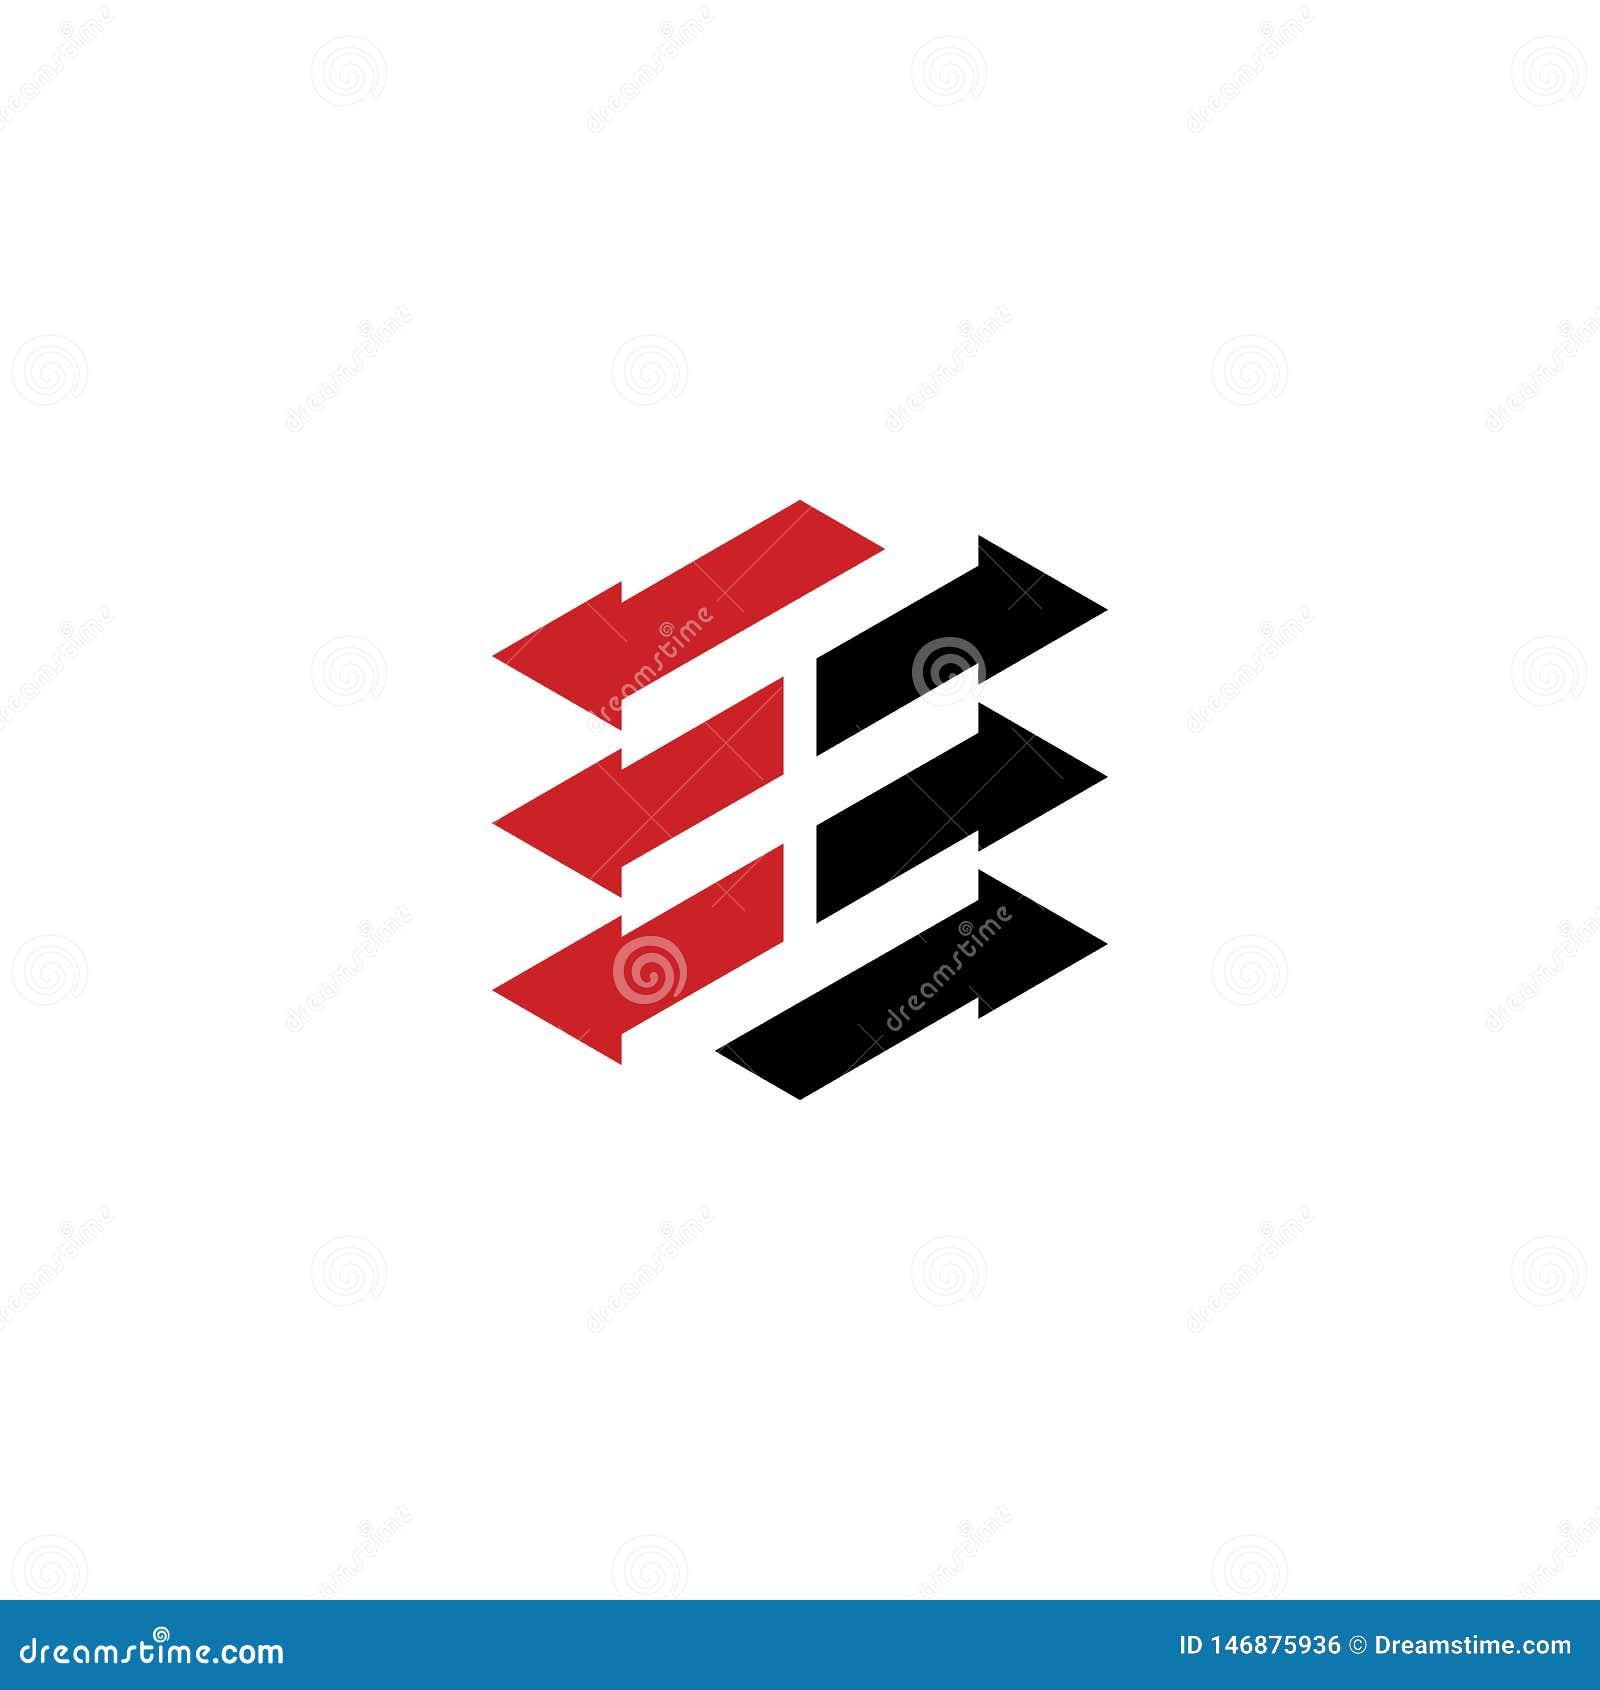 Abstract arrow business logo Design